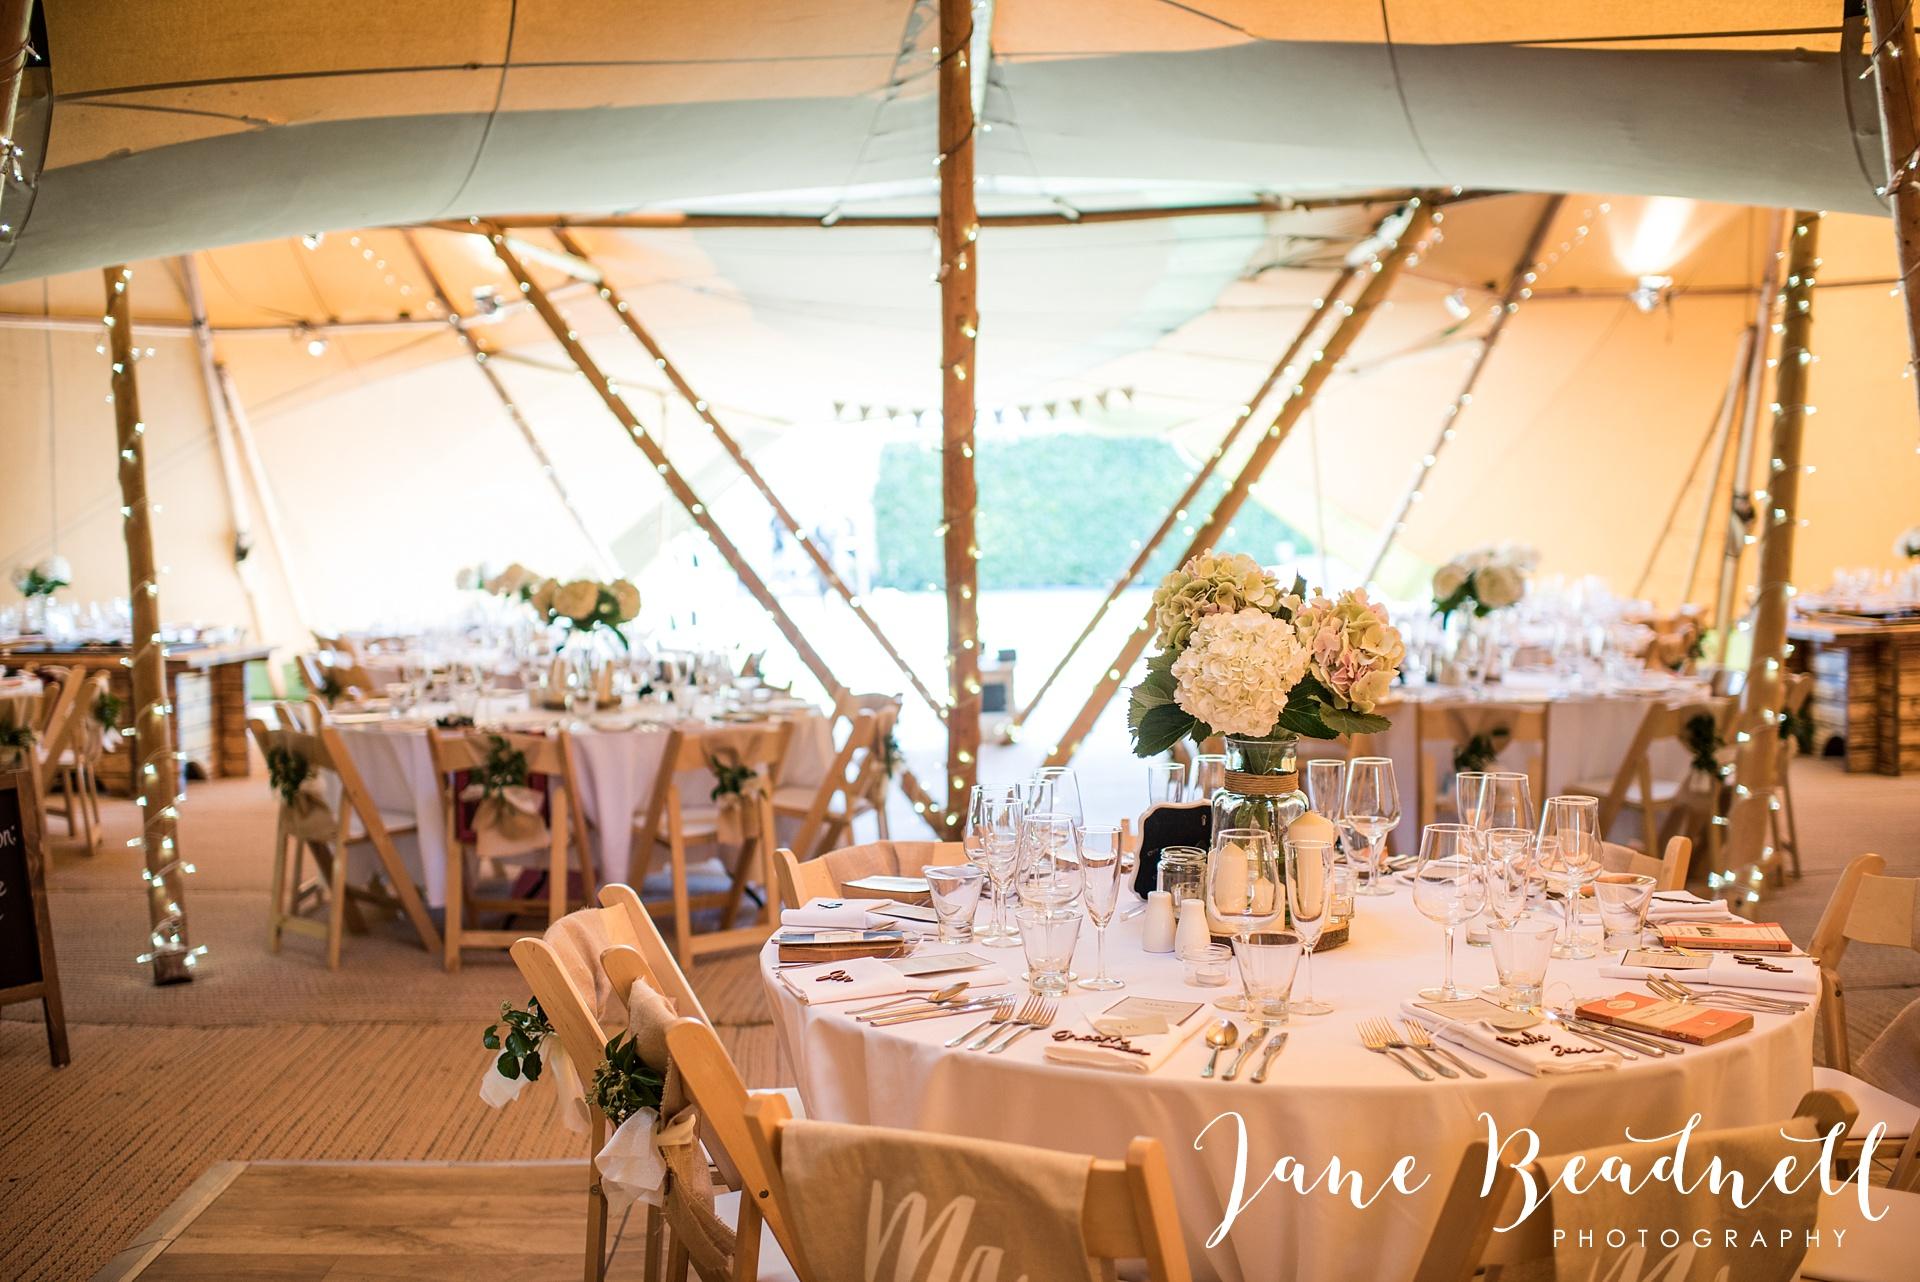 fine-art-wedding-photographer-jane-beadnell-yorkshire-wedding-photographer_0101